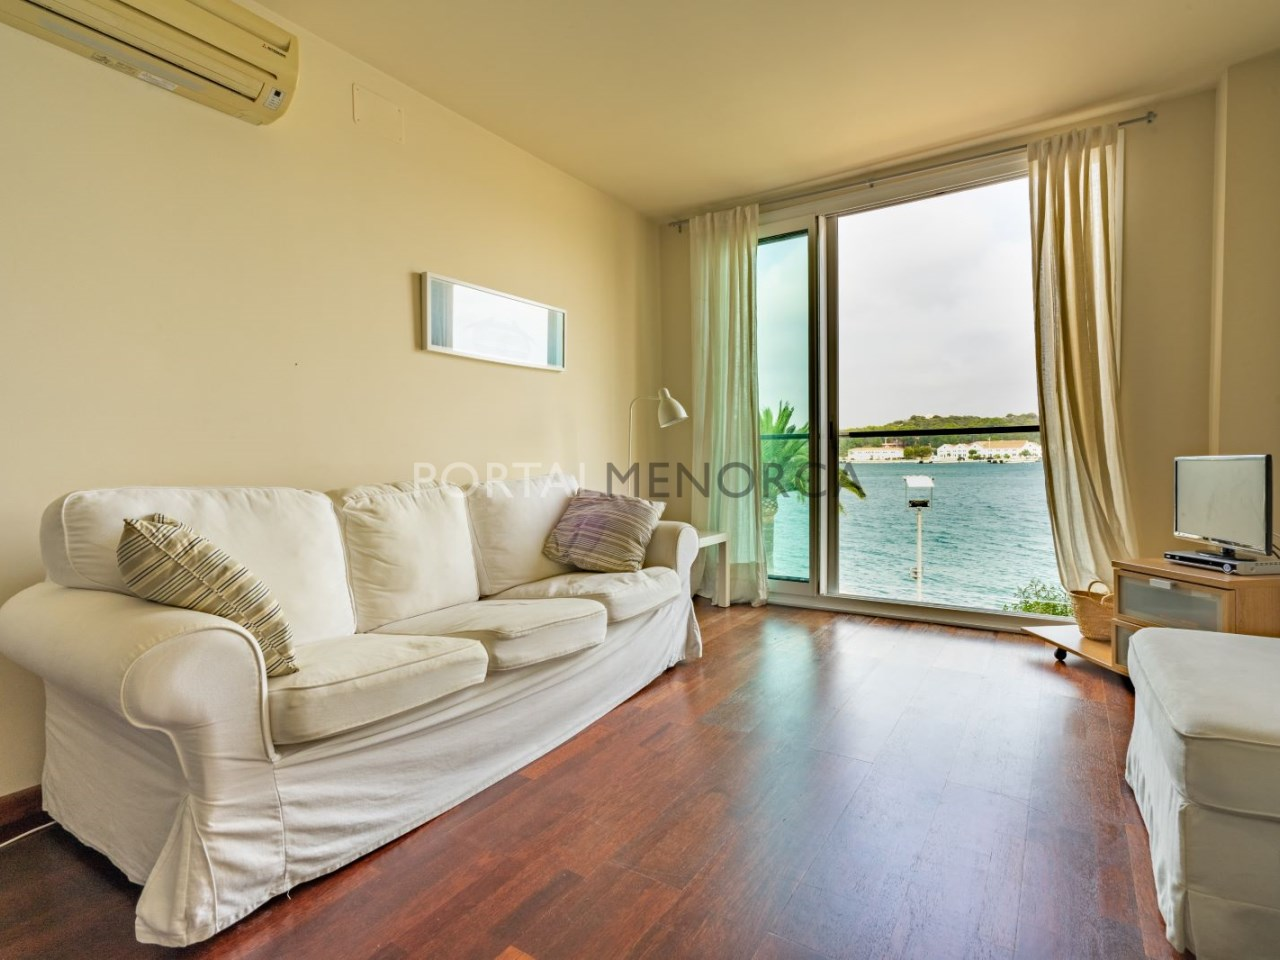 buy-house-apartment-menorca (3)